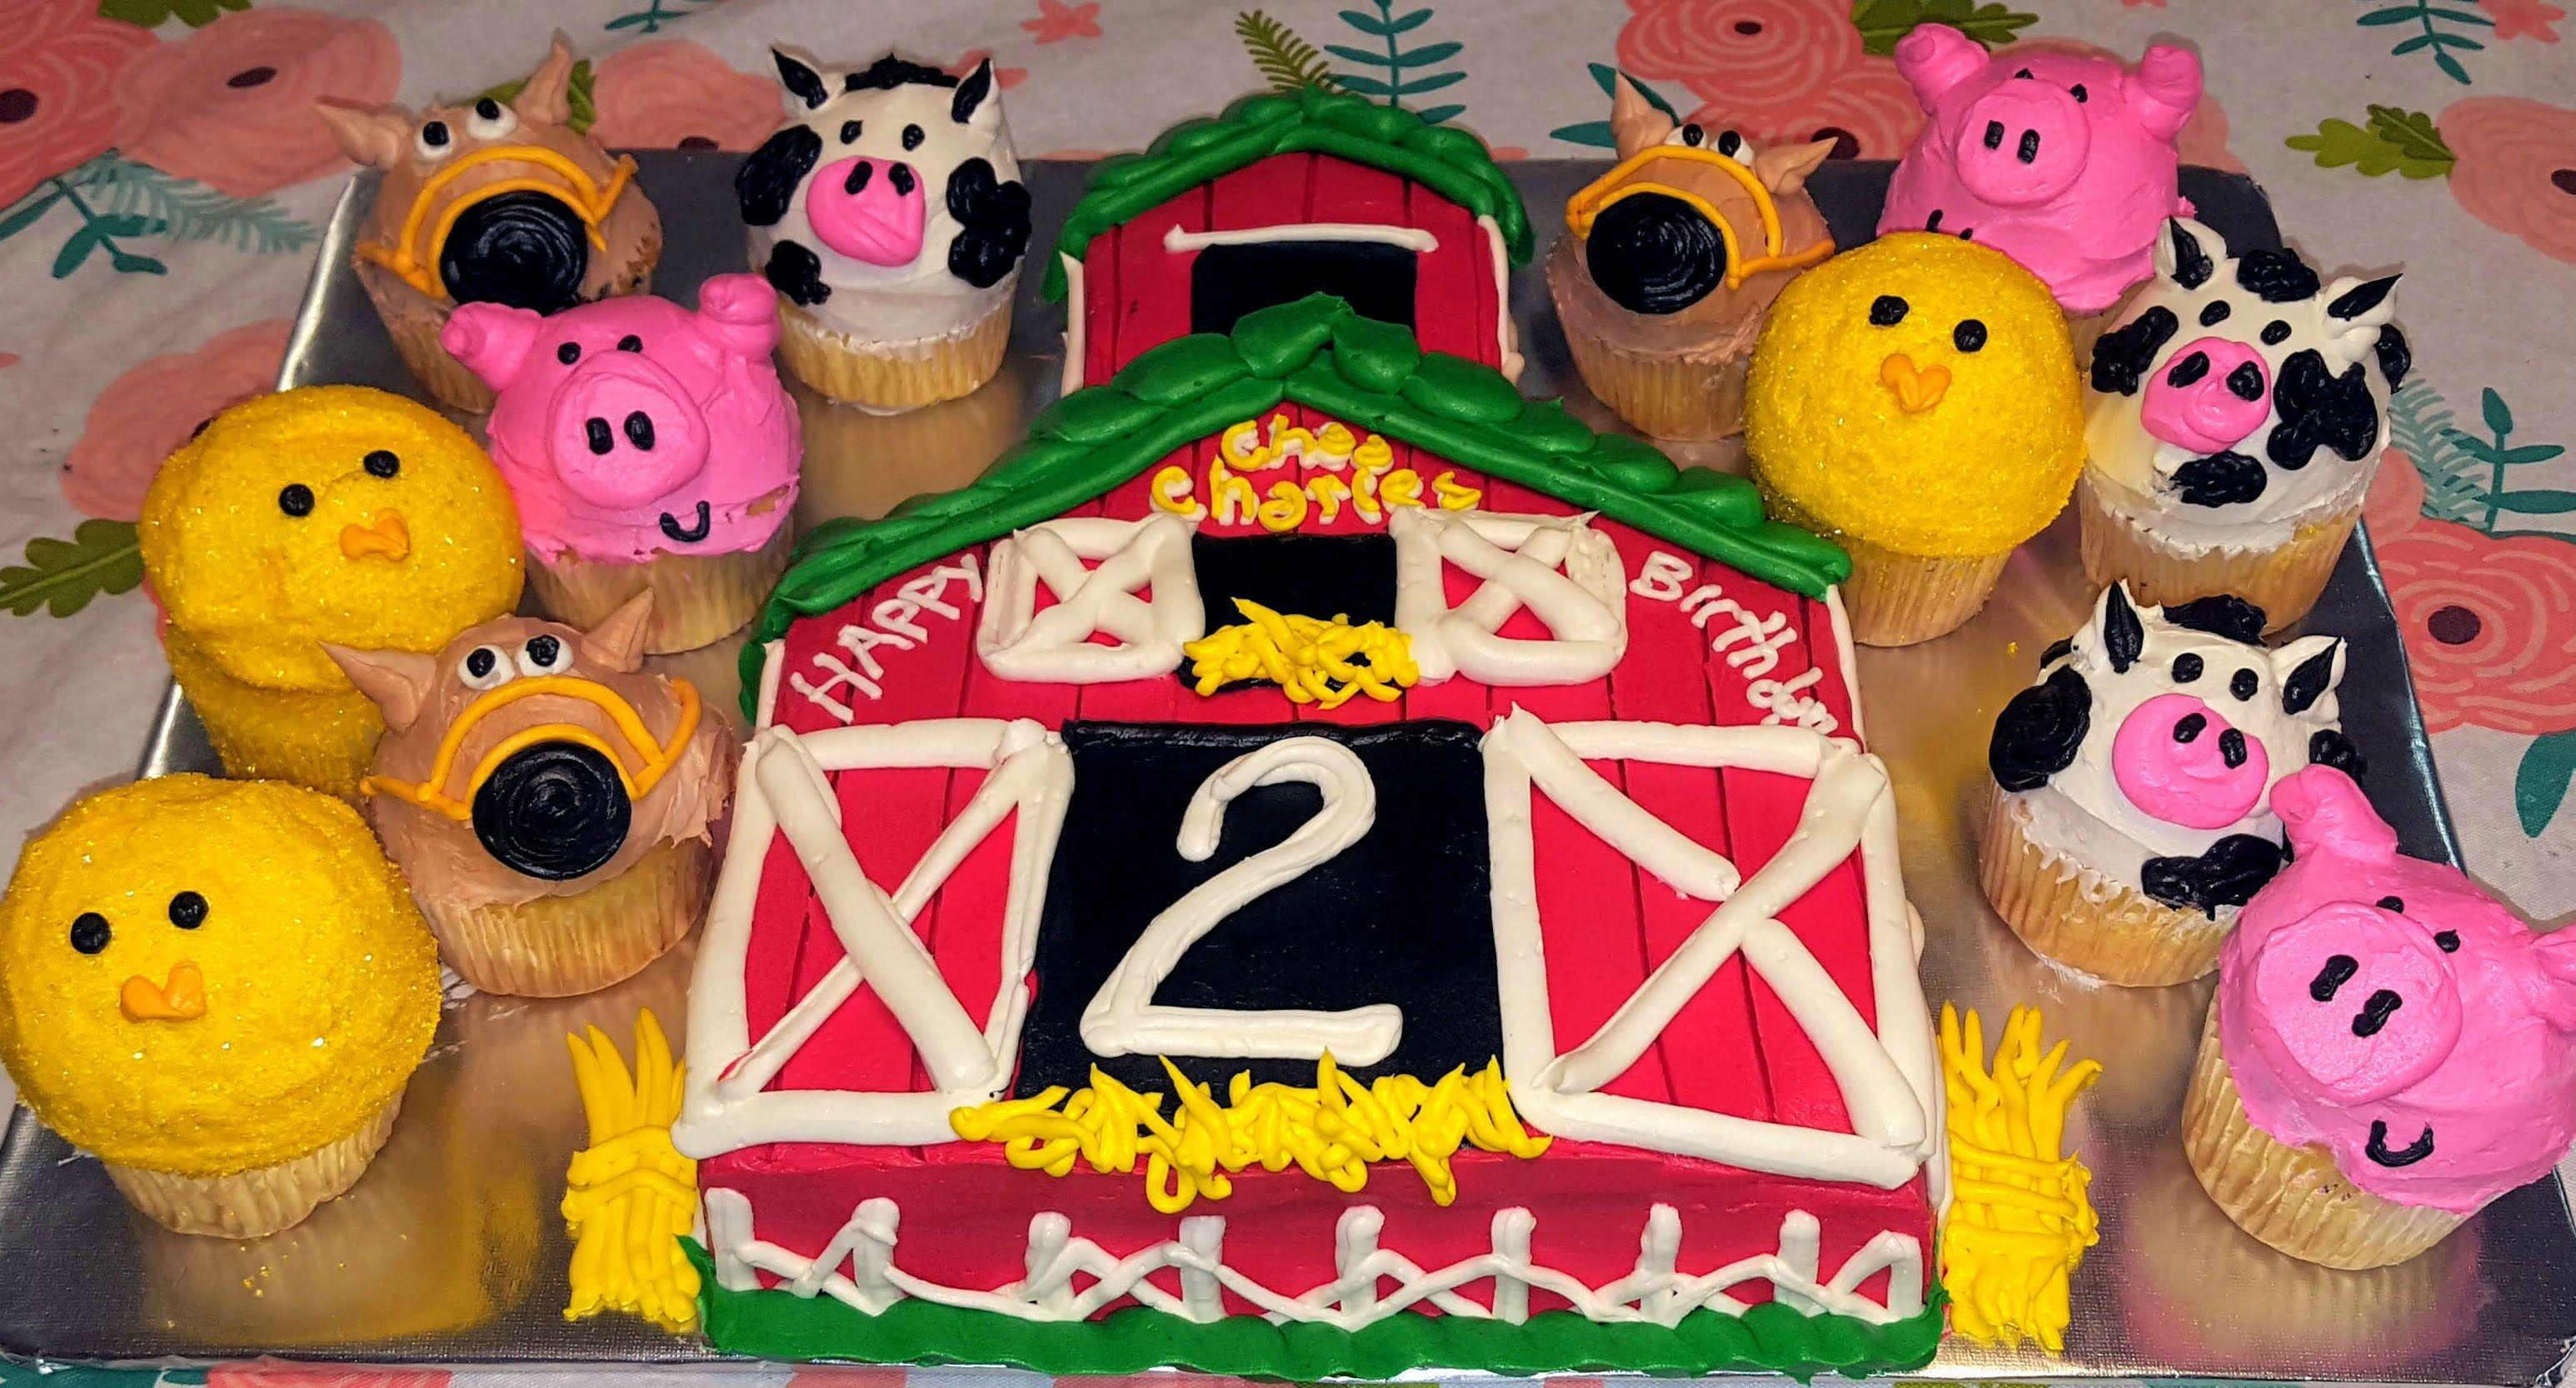 Farm house birthday cake countrybaking menwhobake moo